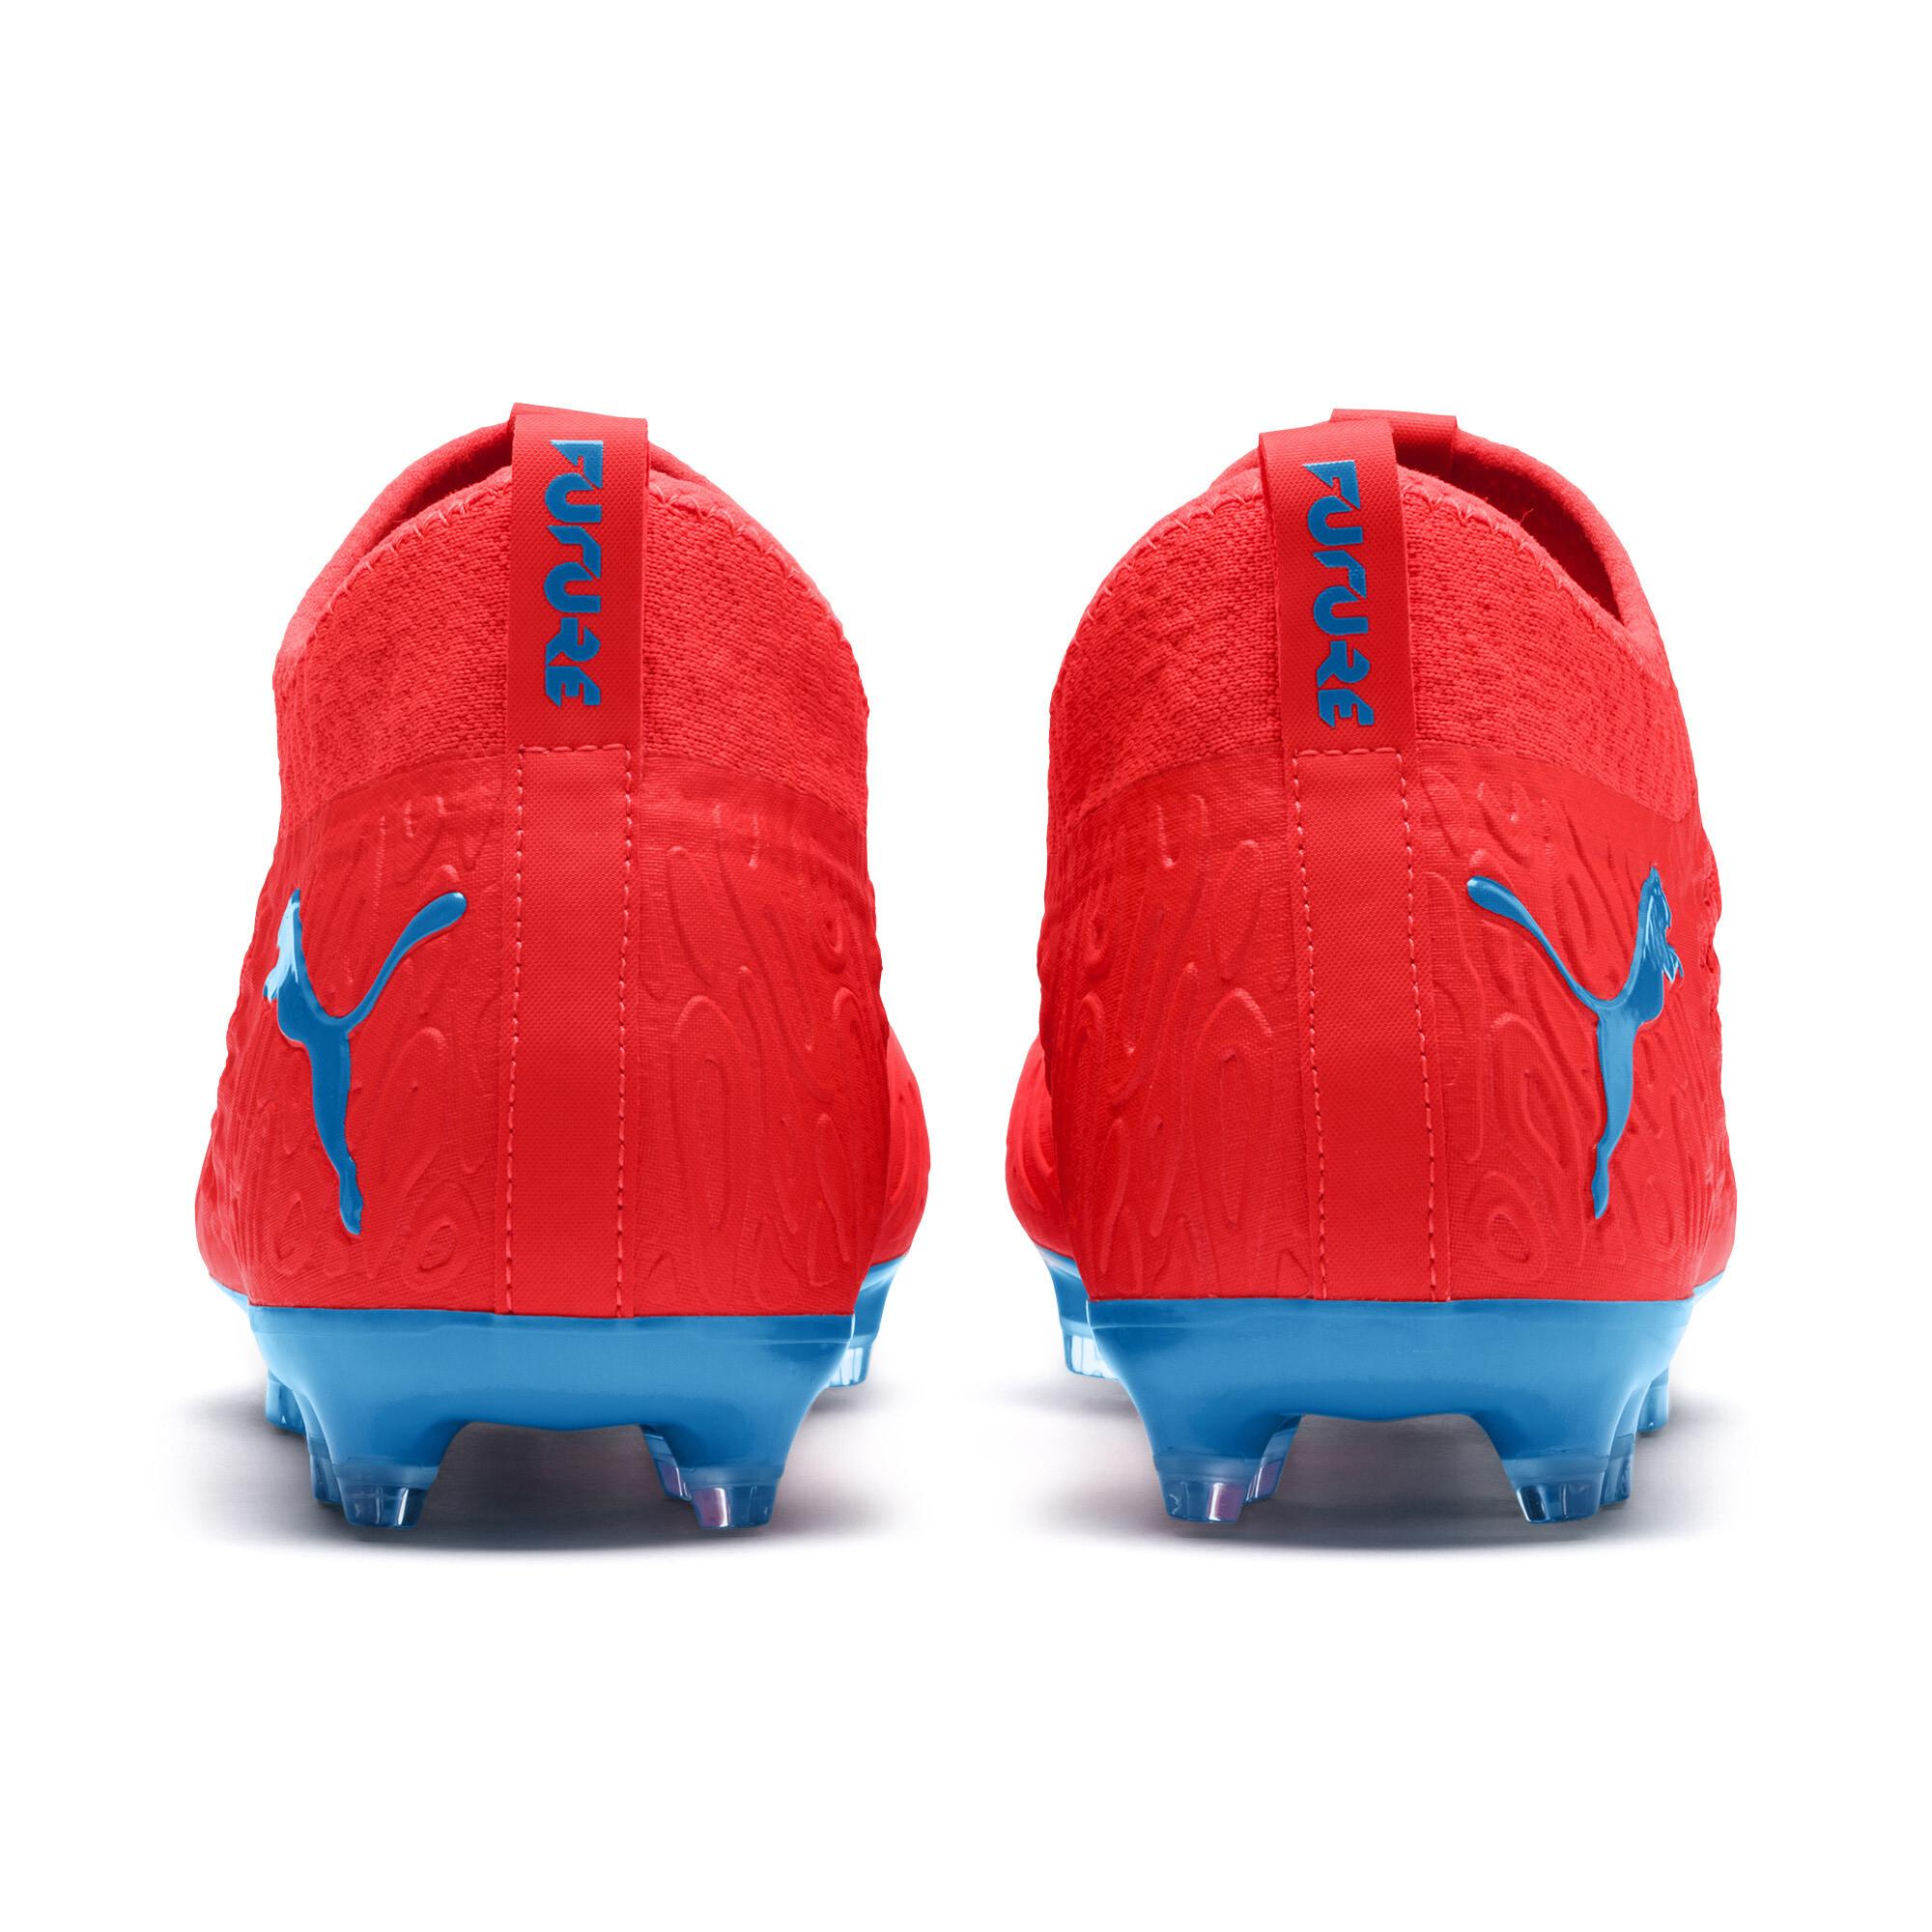 bf3e2adc1c5d FUTURE 19.3 NETFIT FG/AG Men's Football Boots | 120 - Red | Puma